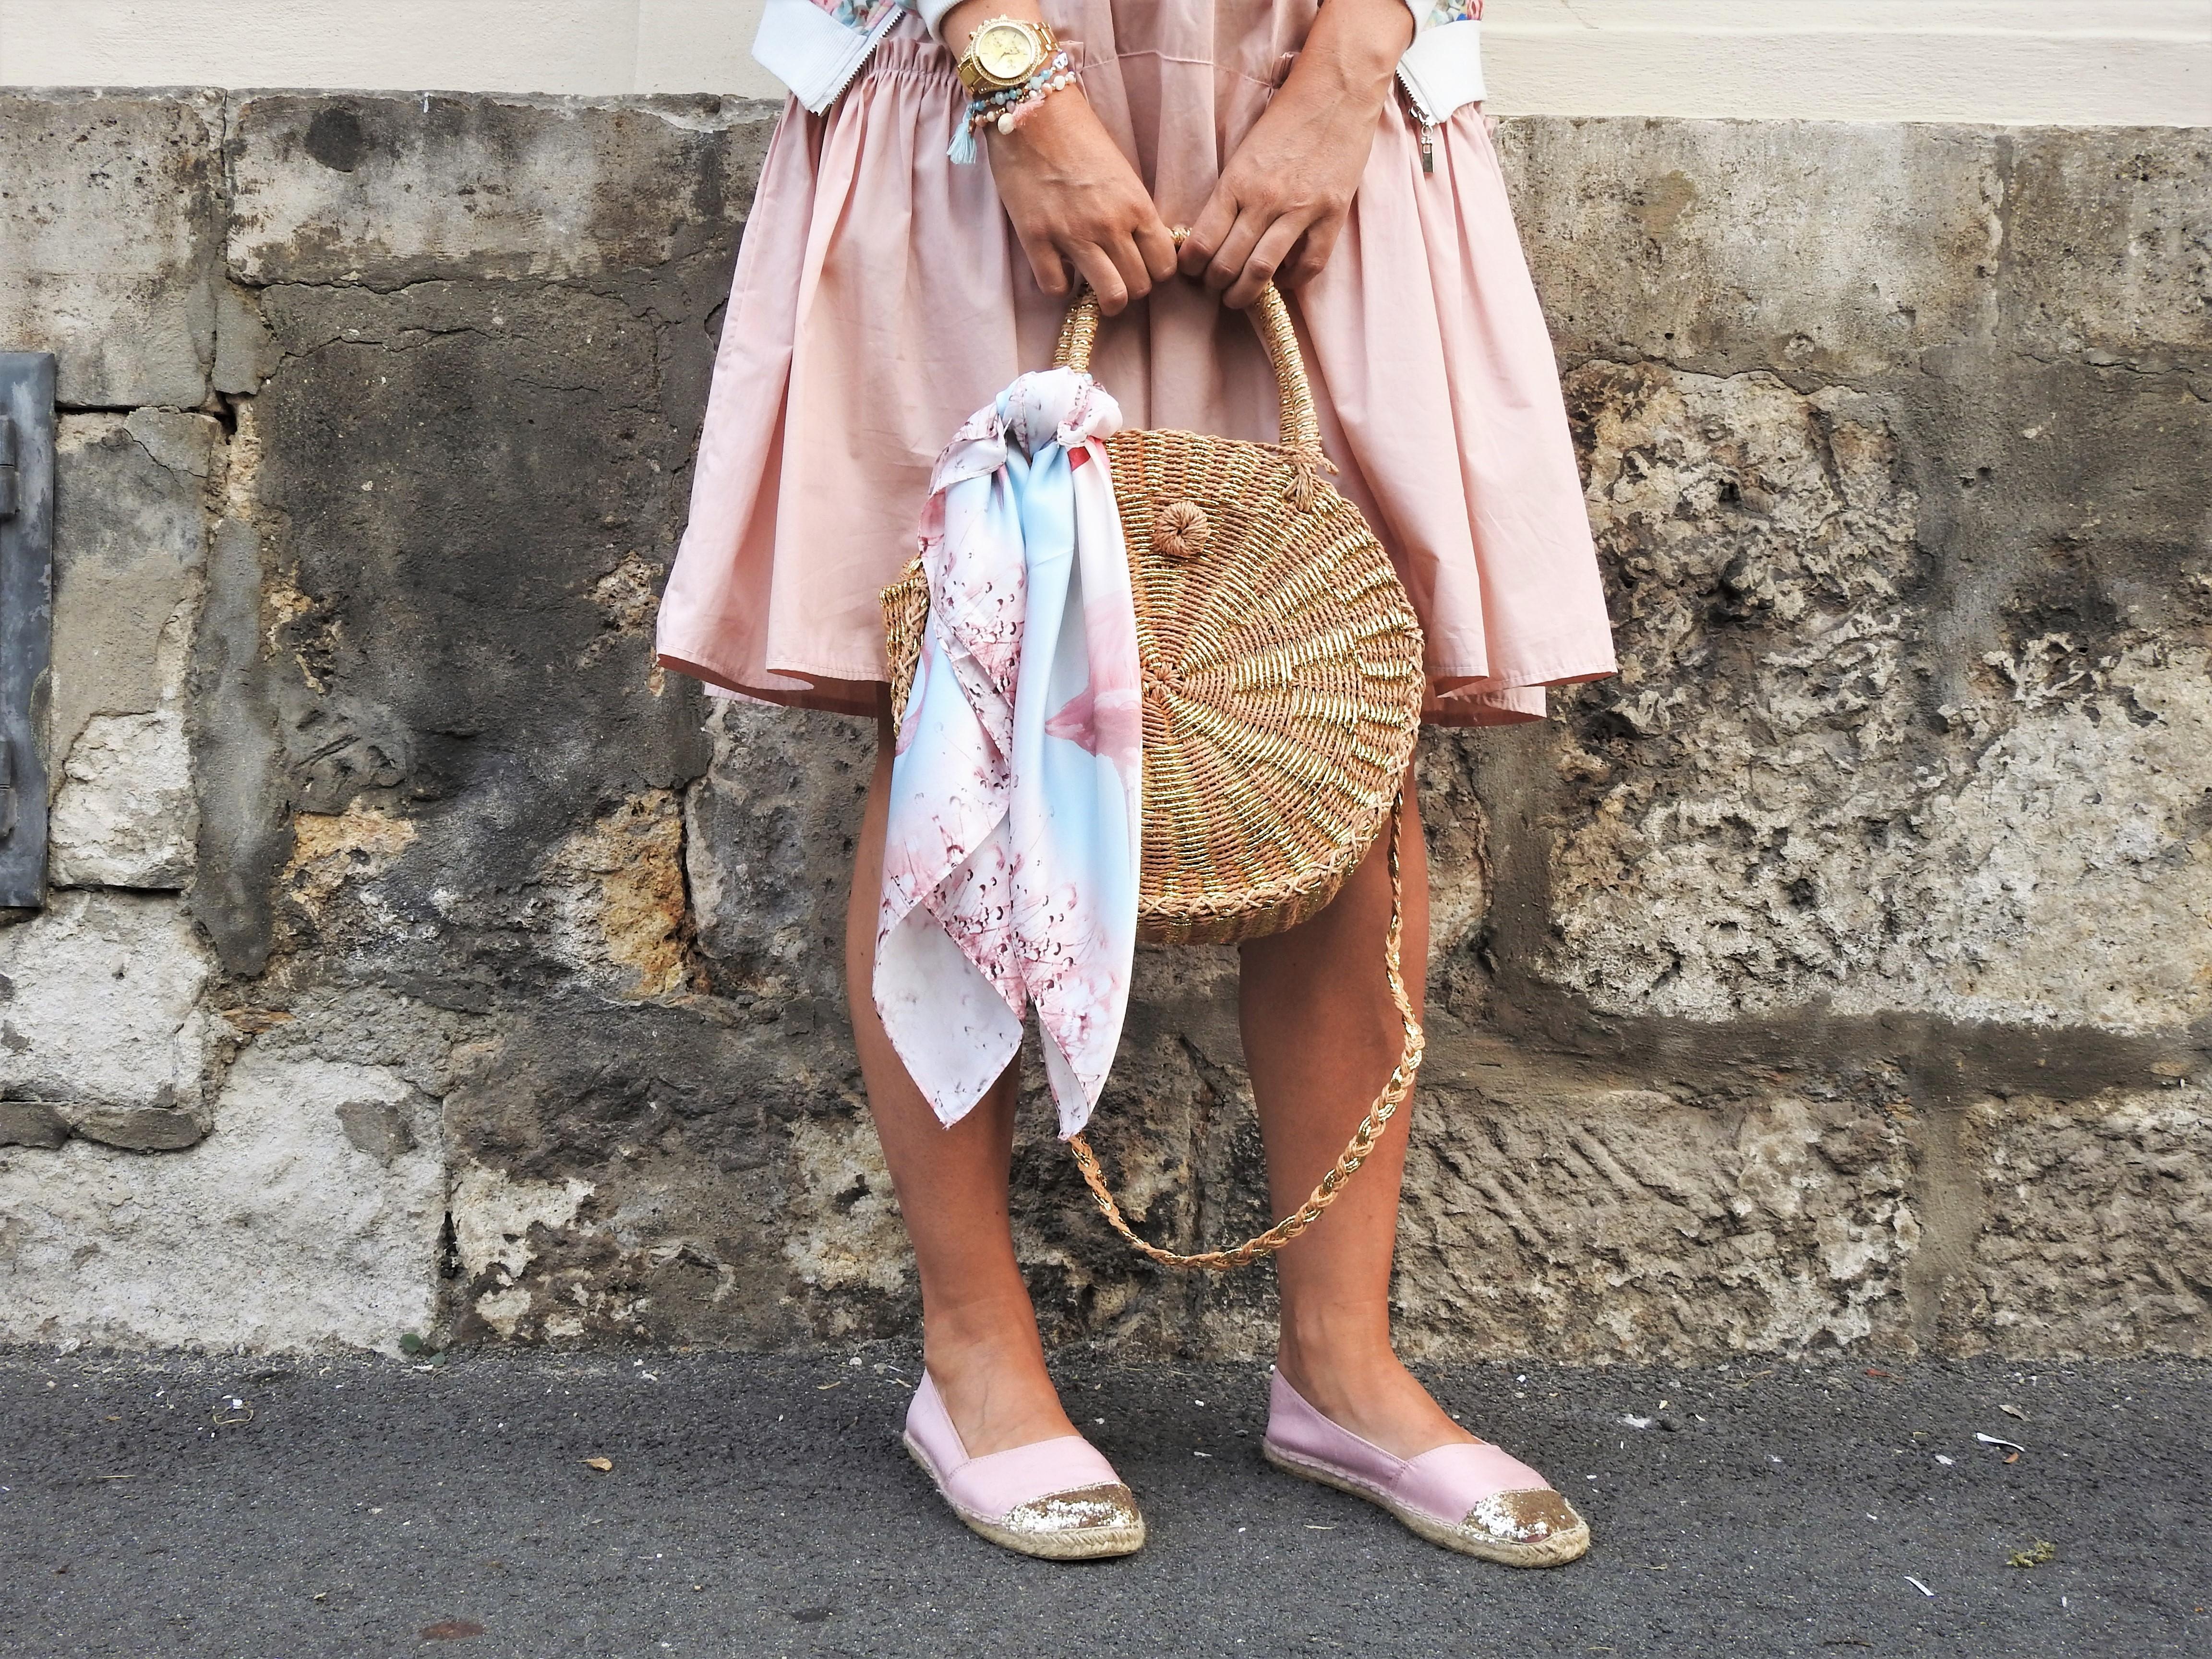 Korbtaschen-Basttaschen-Rund-Pink-Dress-Espadrilles-Pailetten-Gold-Bomberjacket-Floralprint-carrieslifestyle-Tamara-Prutsch